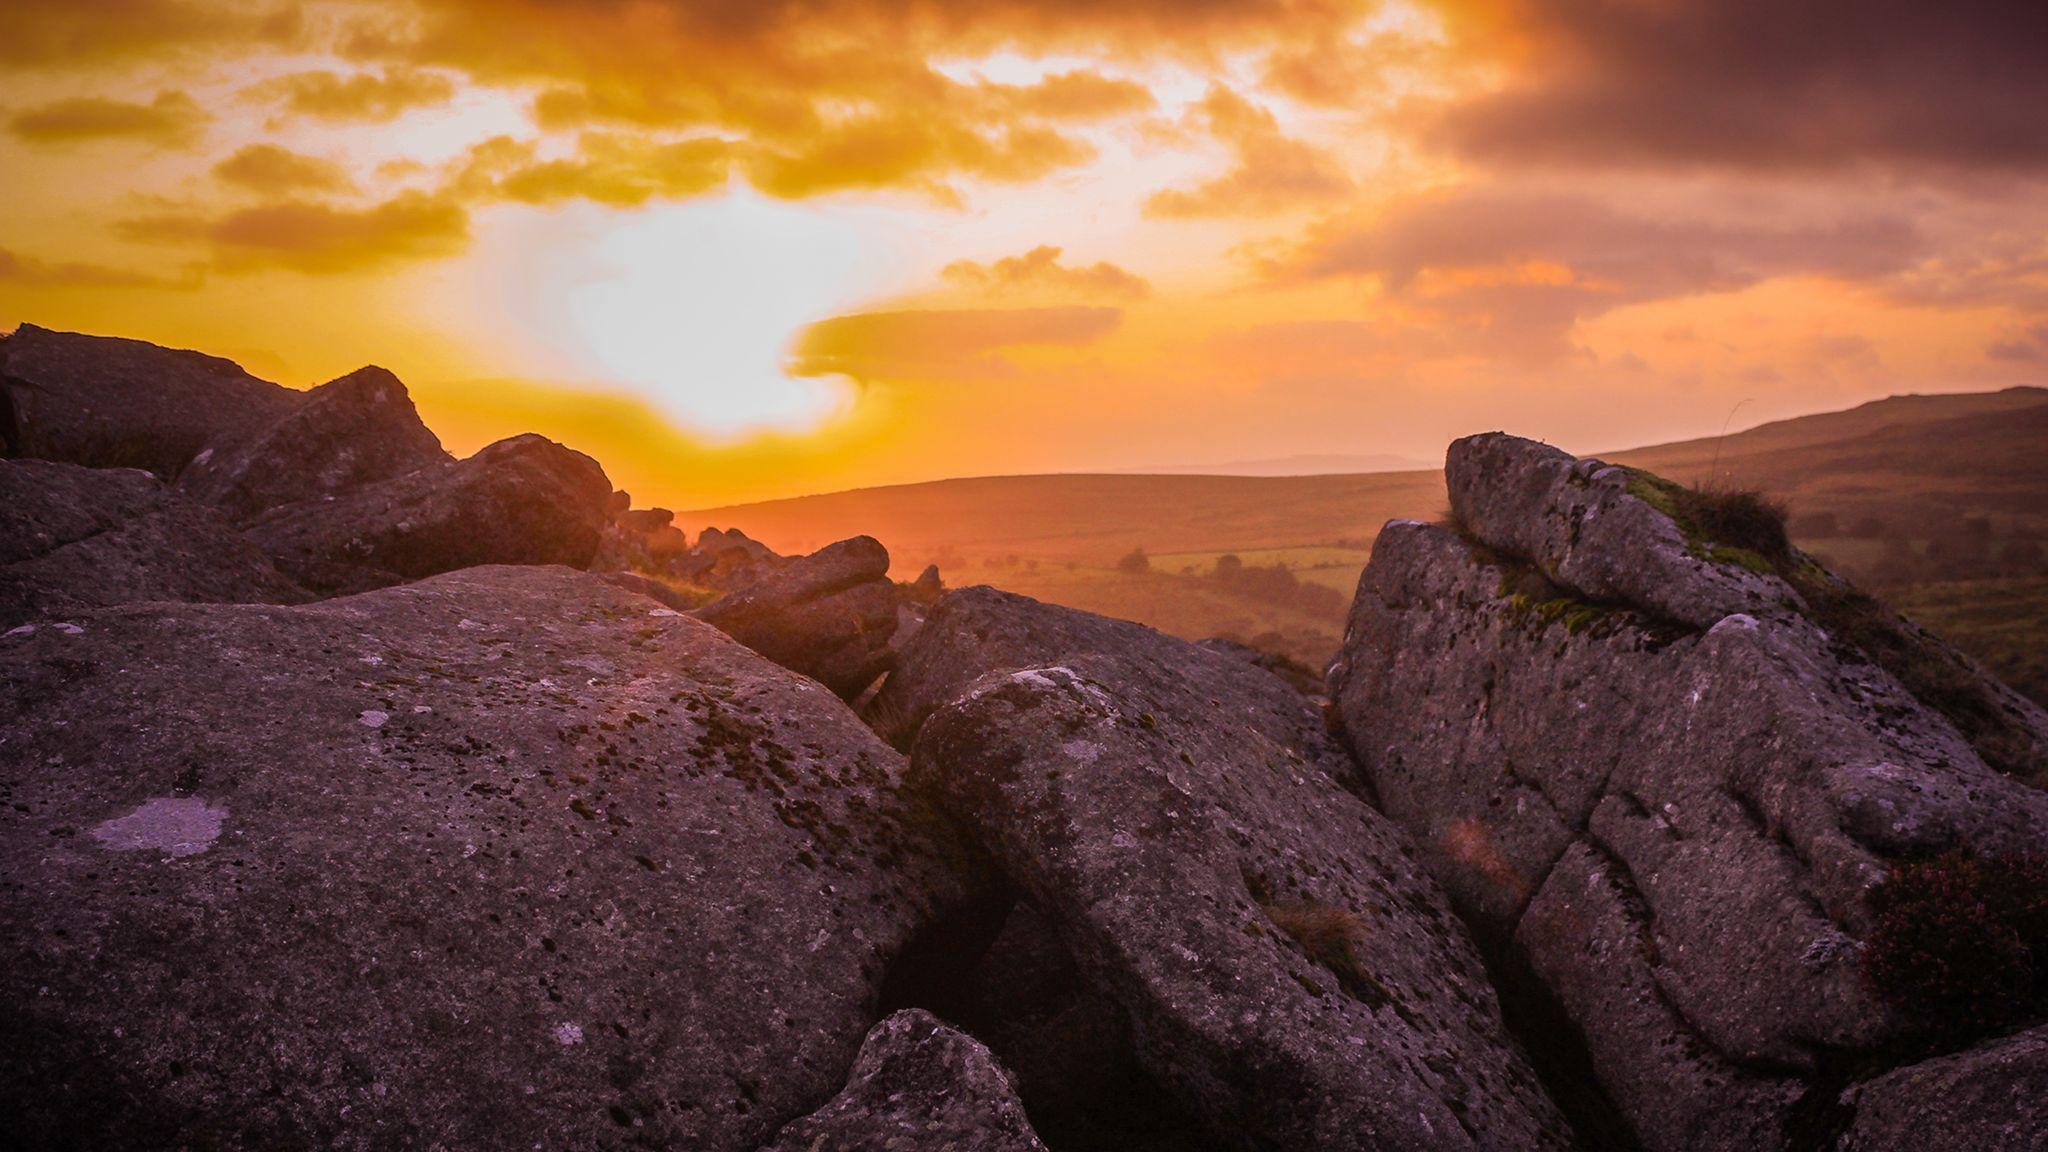 Kingstor Rocks, United Kingdom